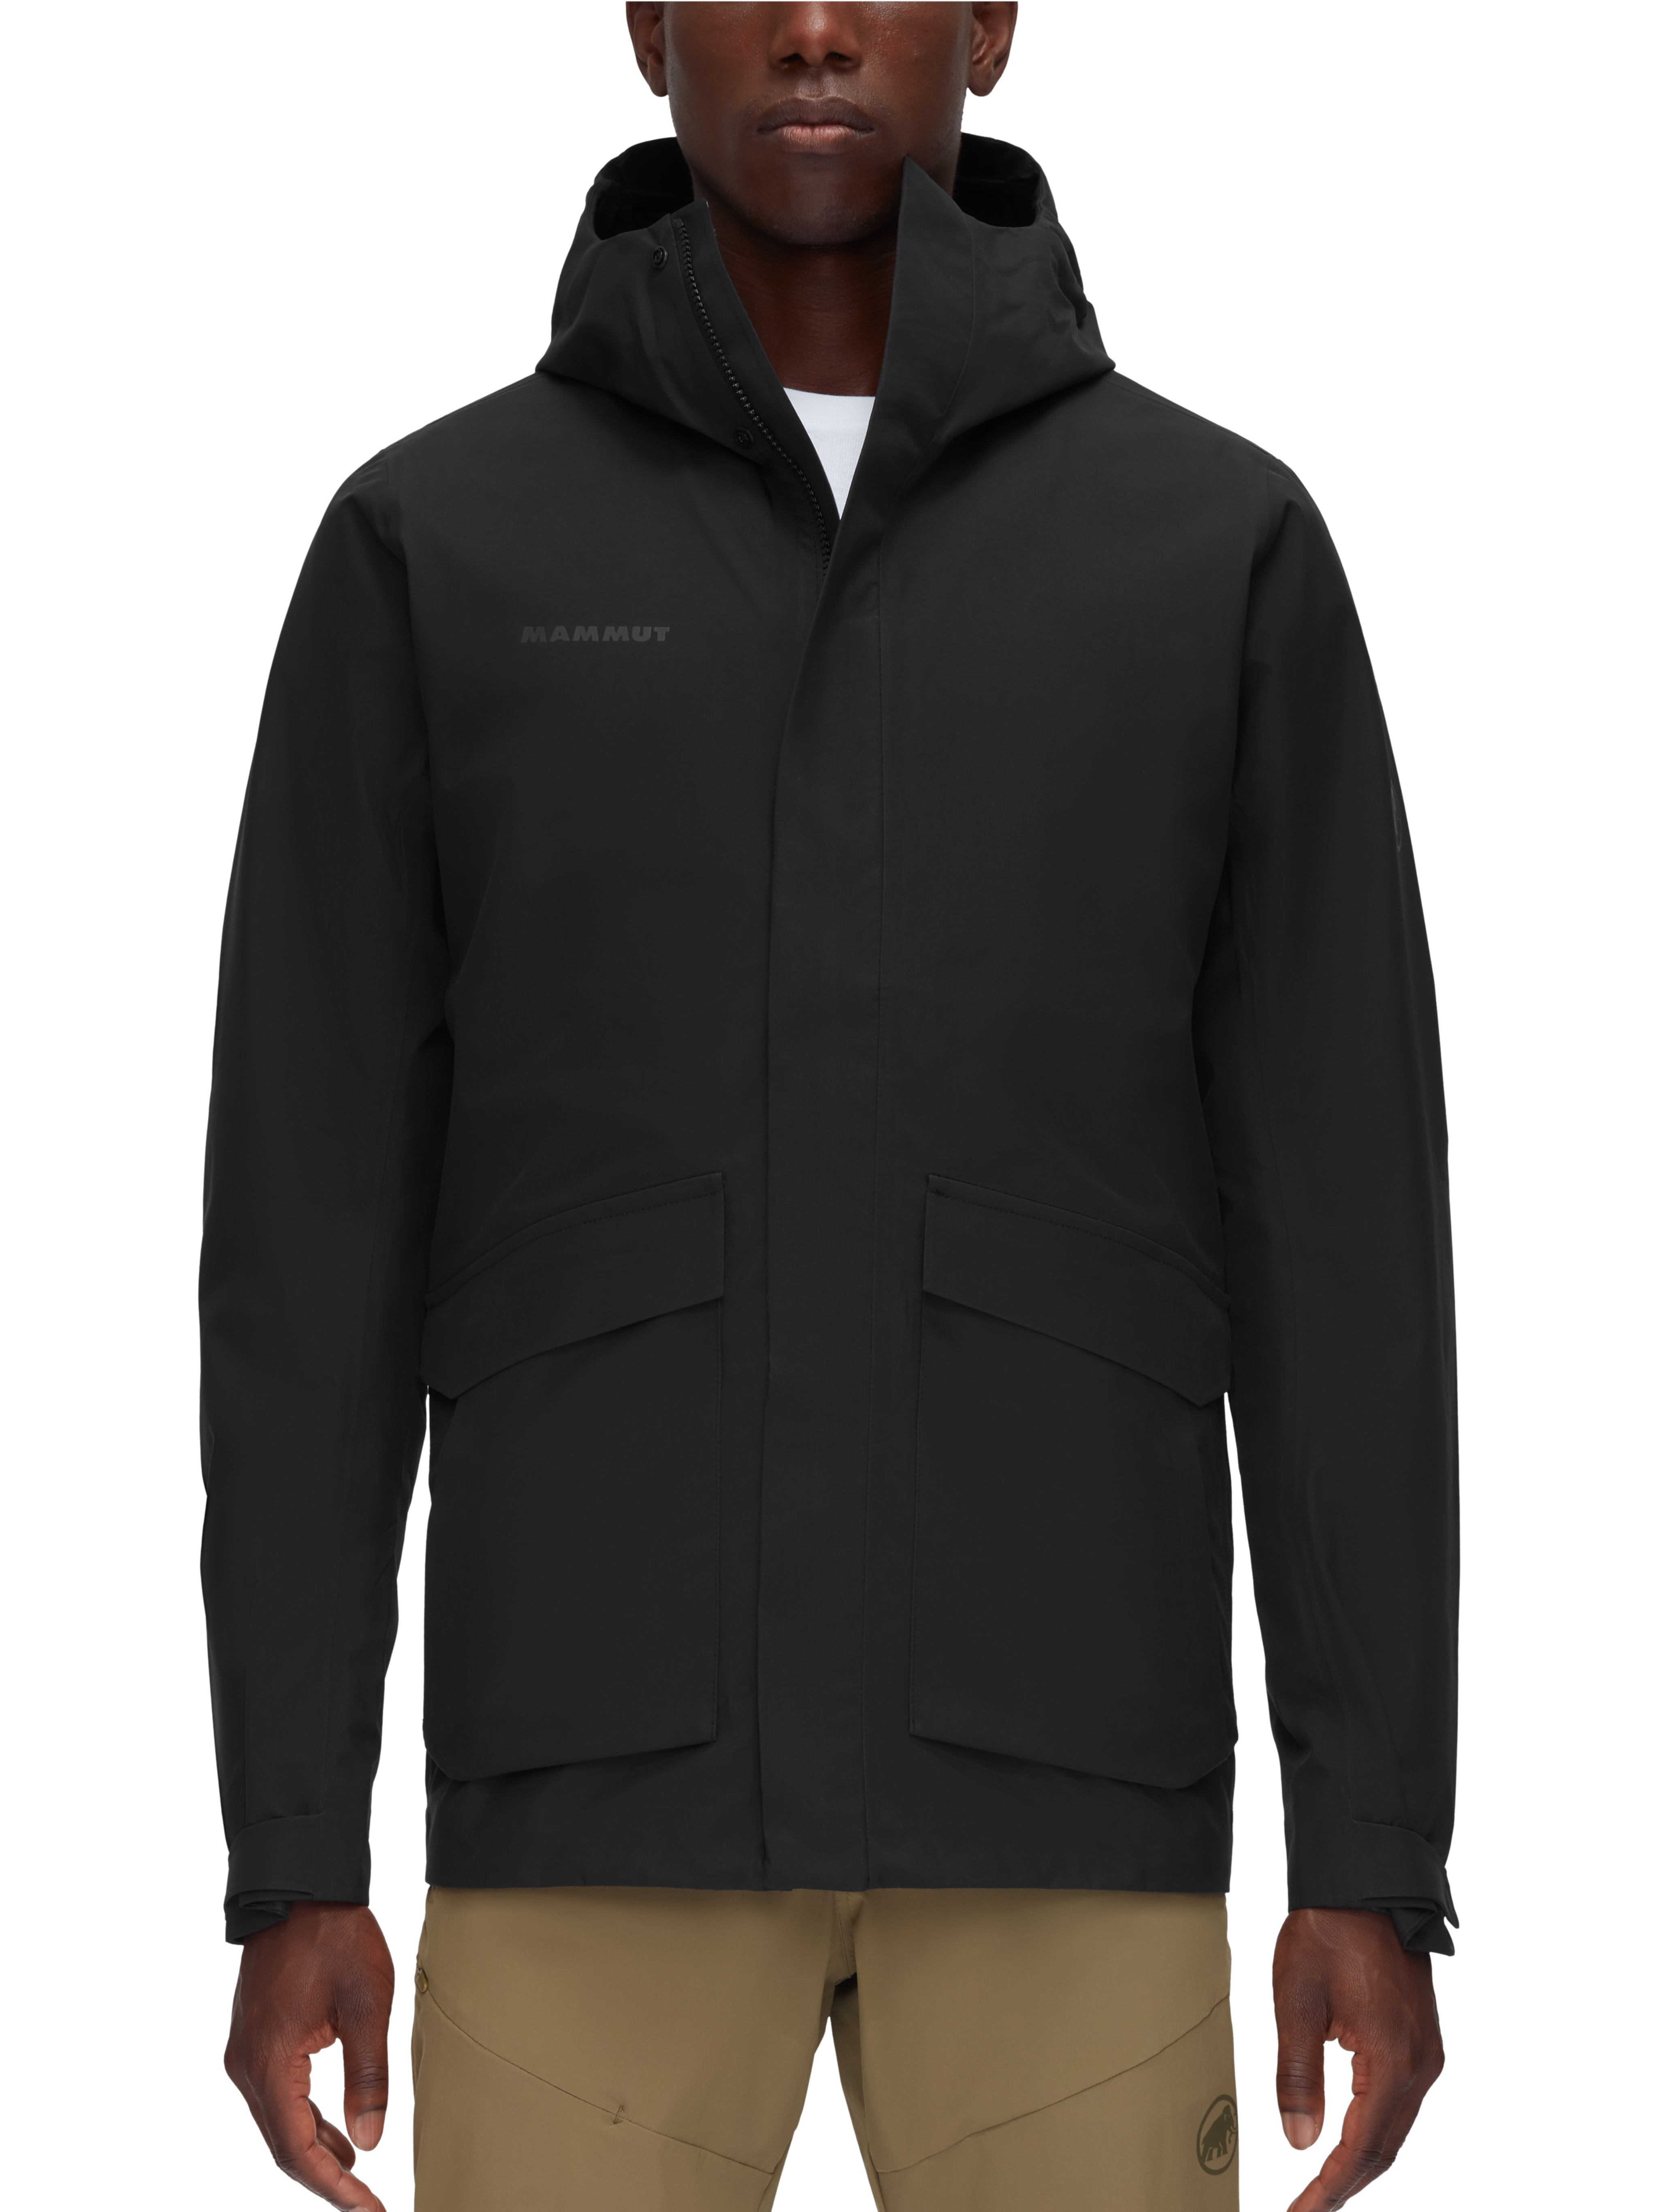 Mammut 3L HS Hooded Jacket Men product image